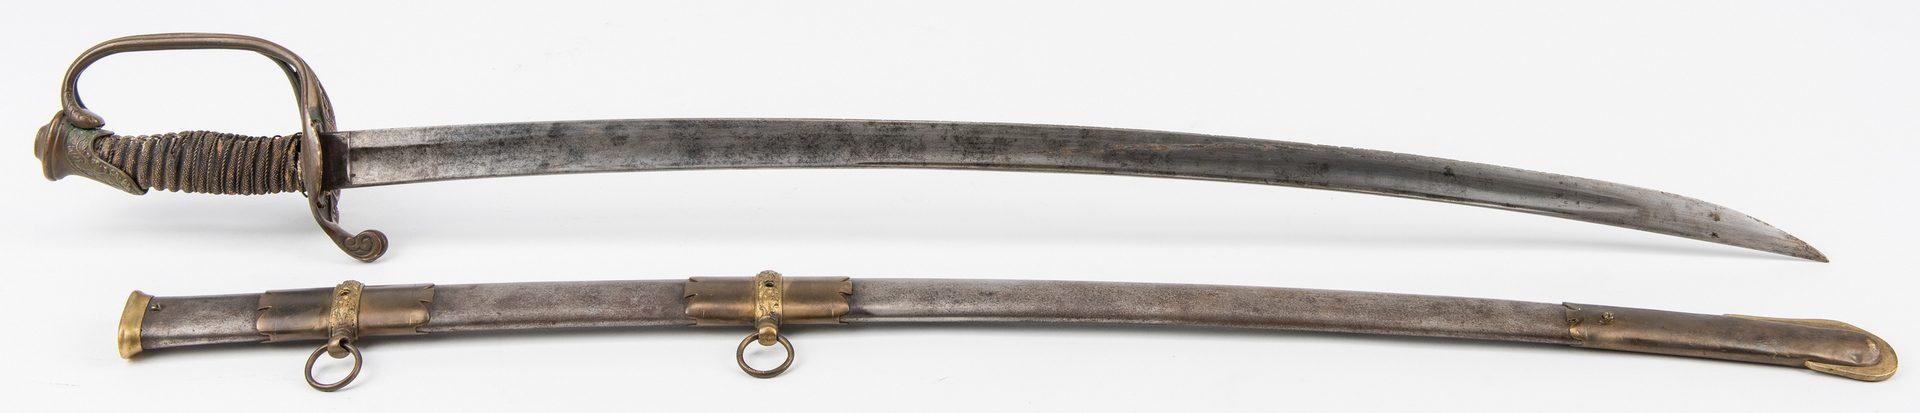 Lot 334: 1862 Presentation Clauberg Model 1840 Sword, Lieut. G. H. North